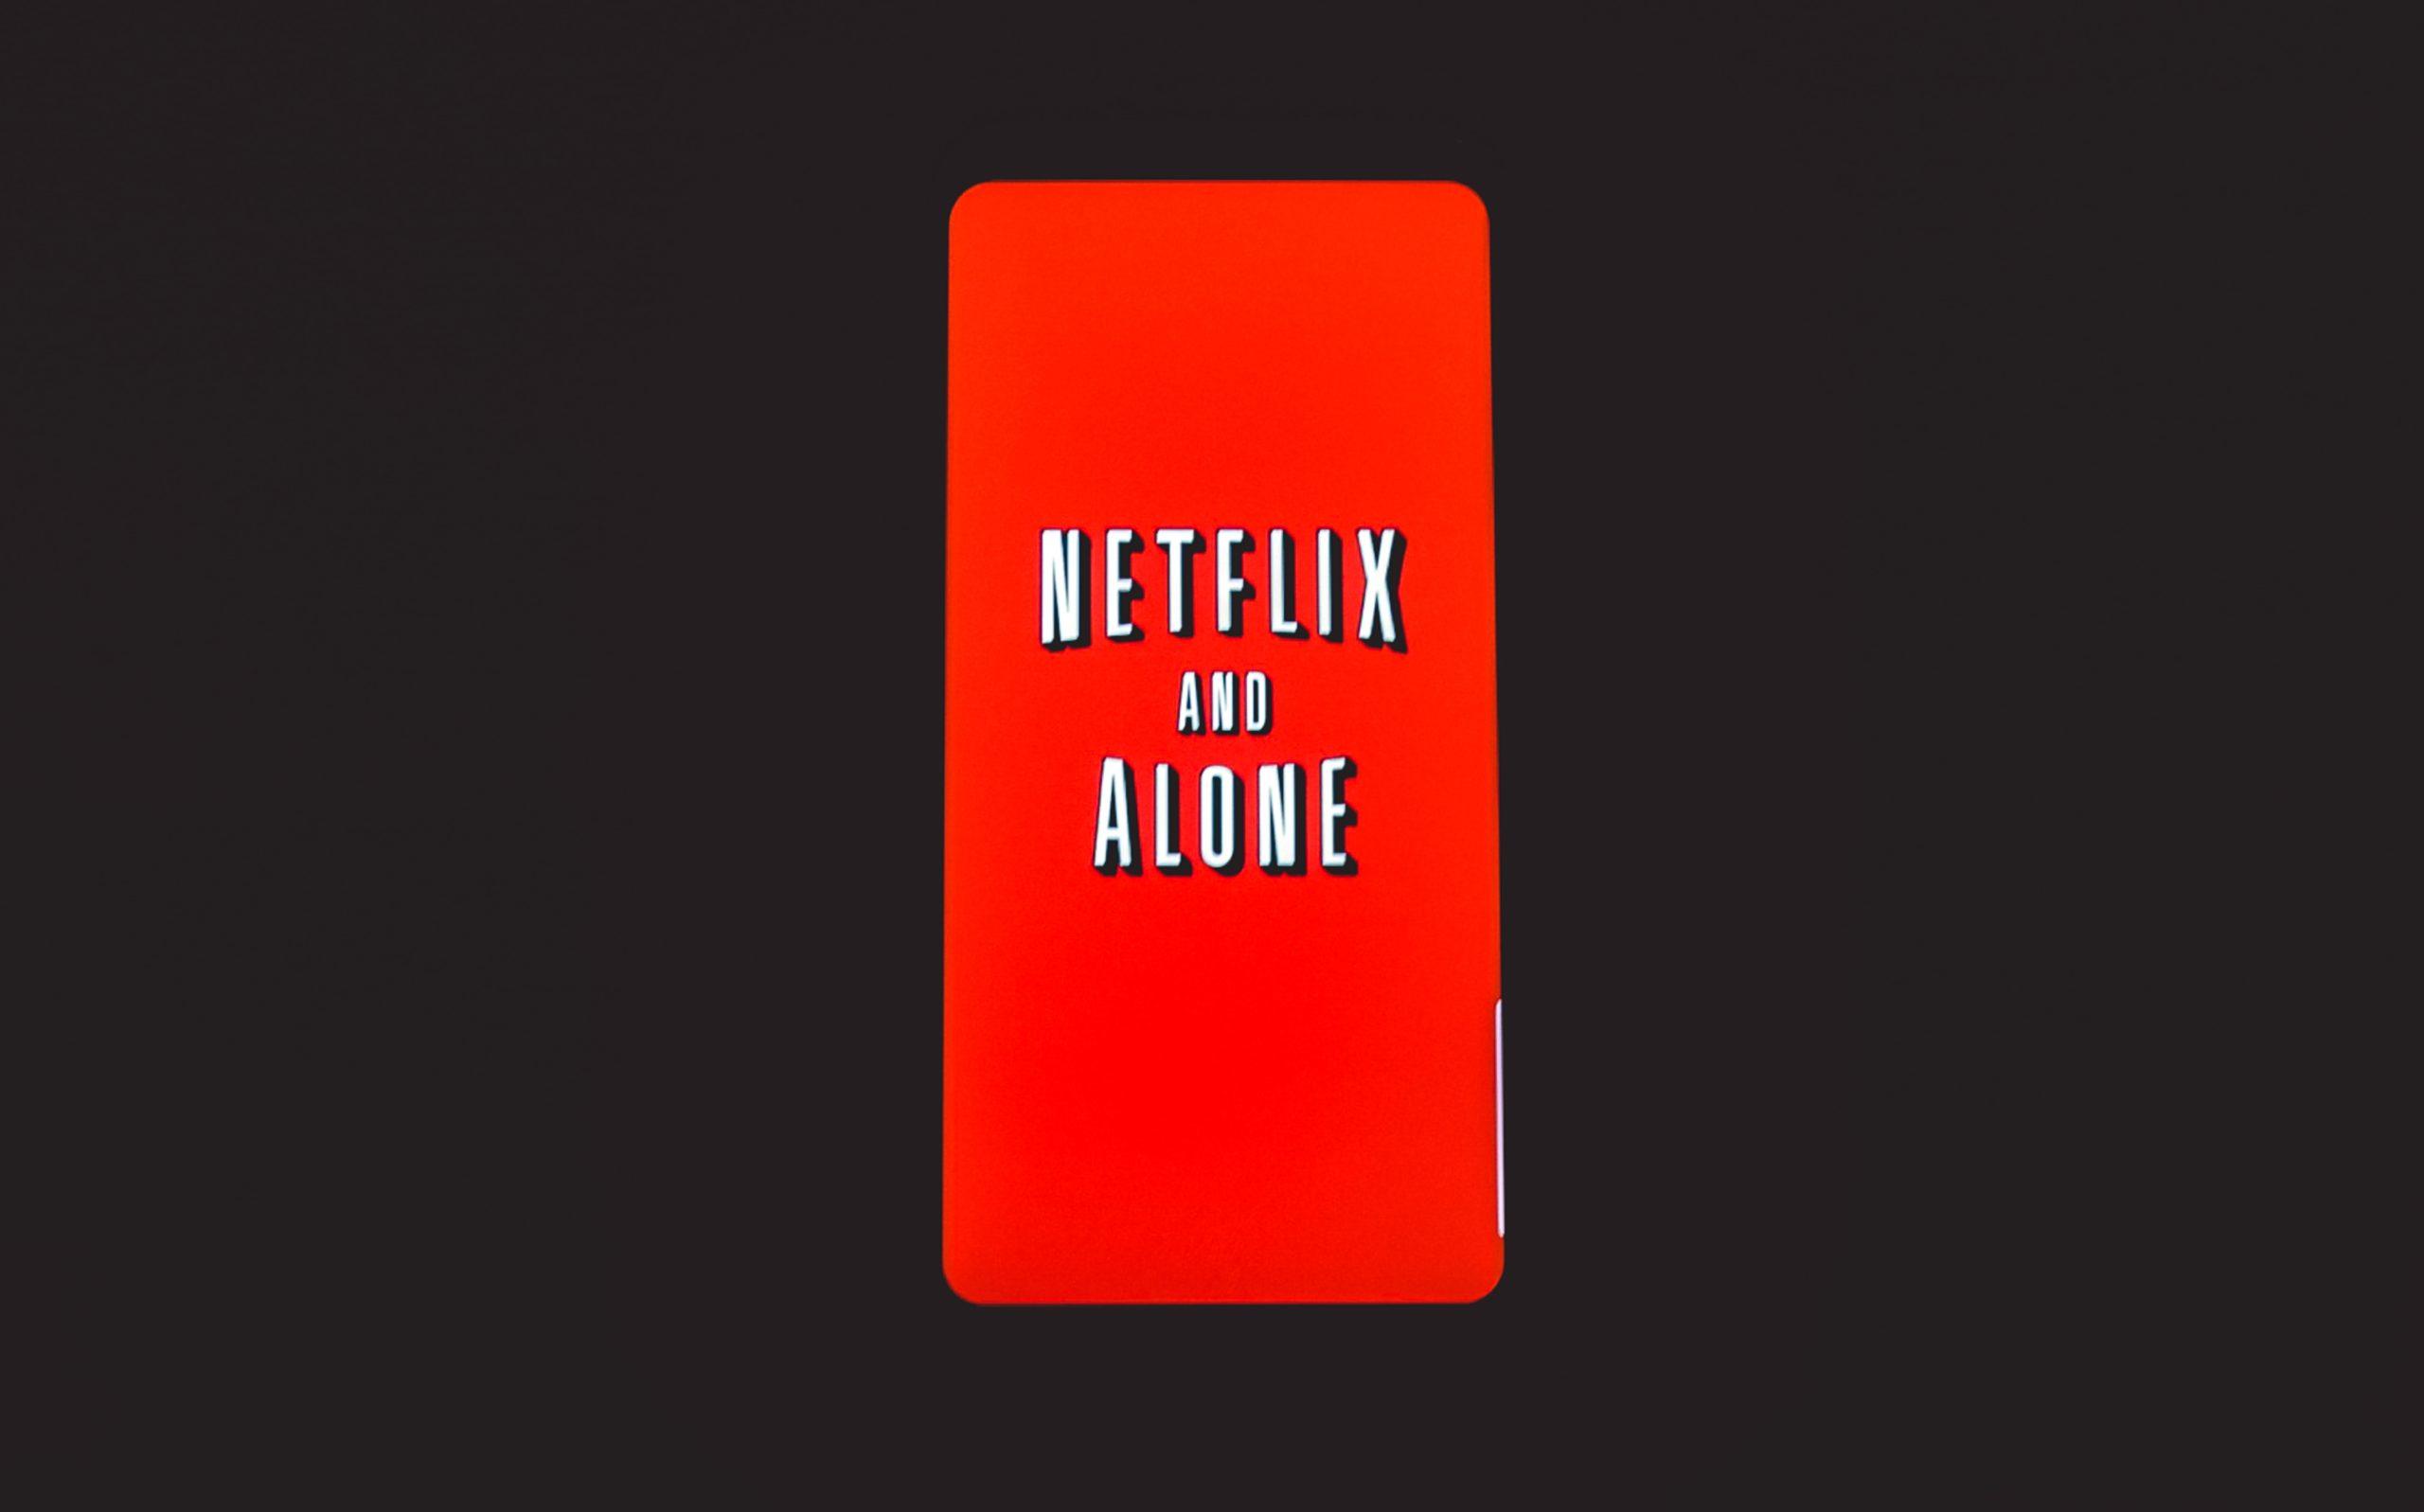 Netflixの概要と特徴